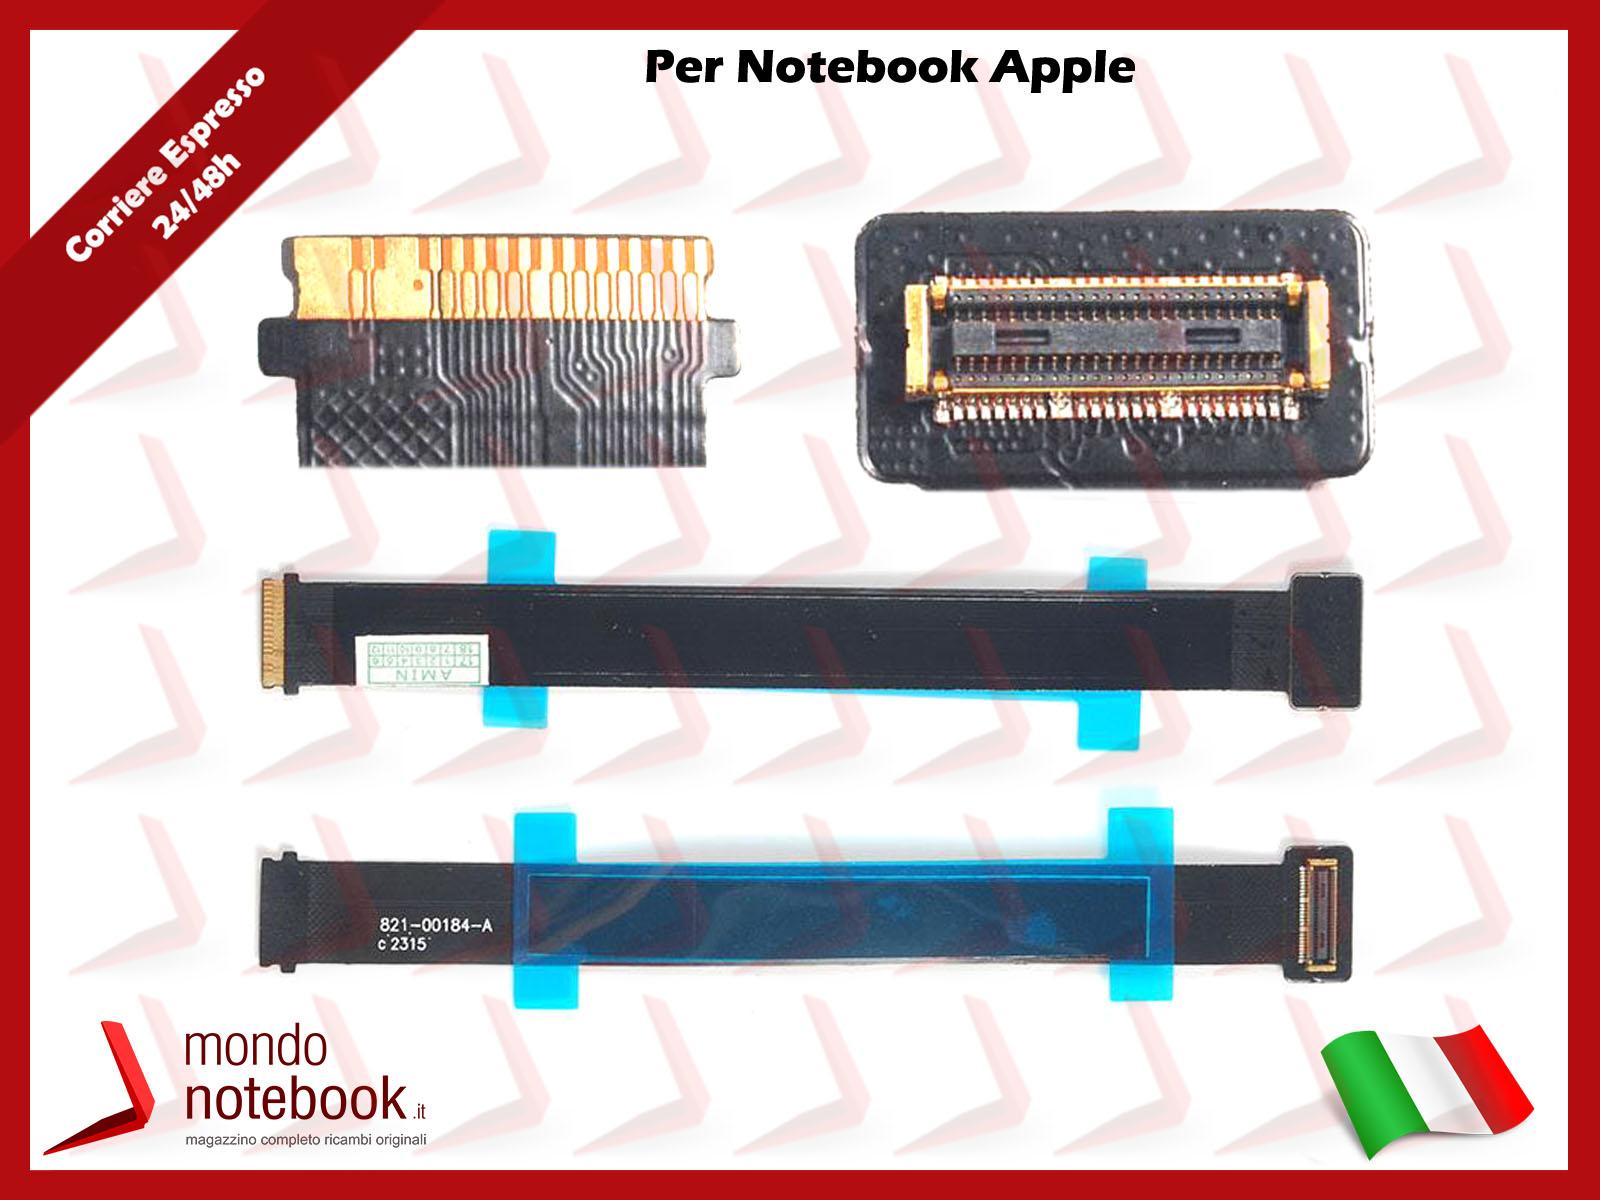 https://www.mondonotebook.it/6349/cavo-touchpad-apple-macbook-pro-retina-13-a1502-2015.jpg